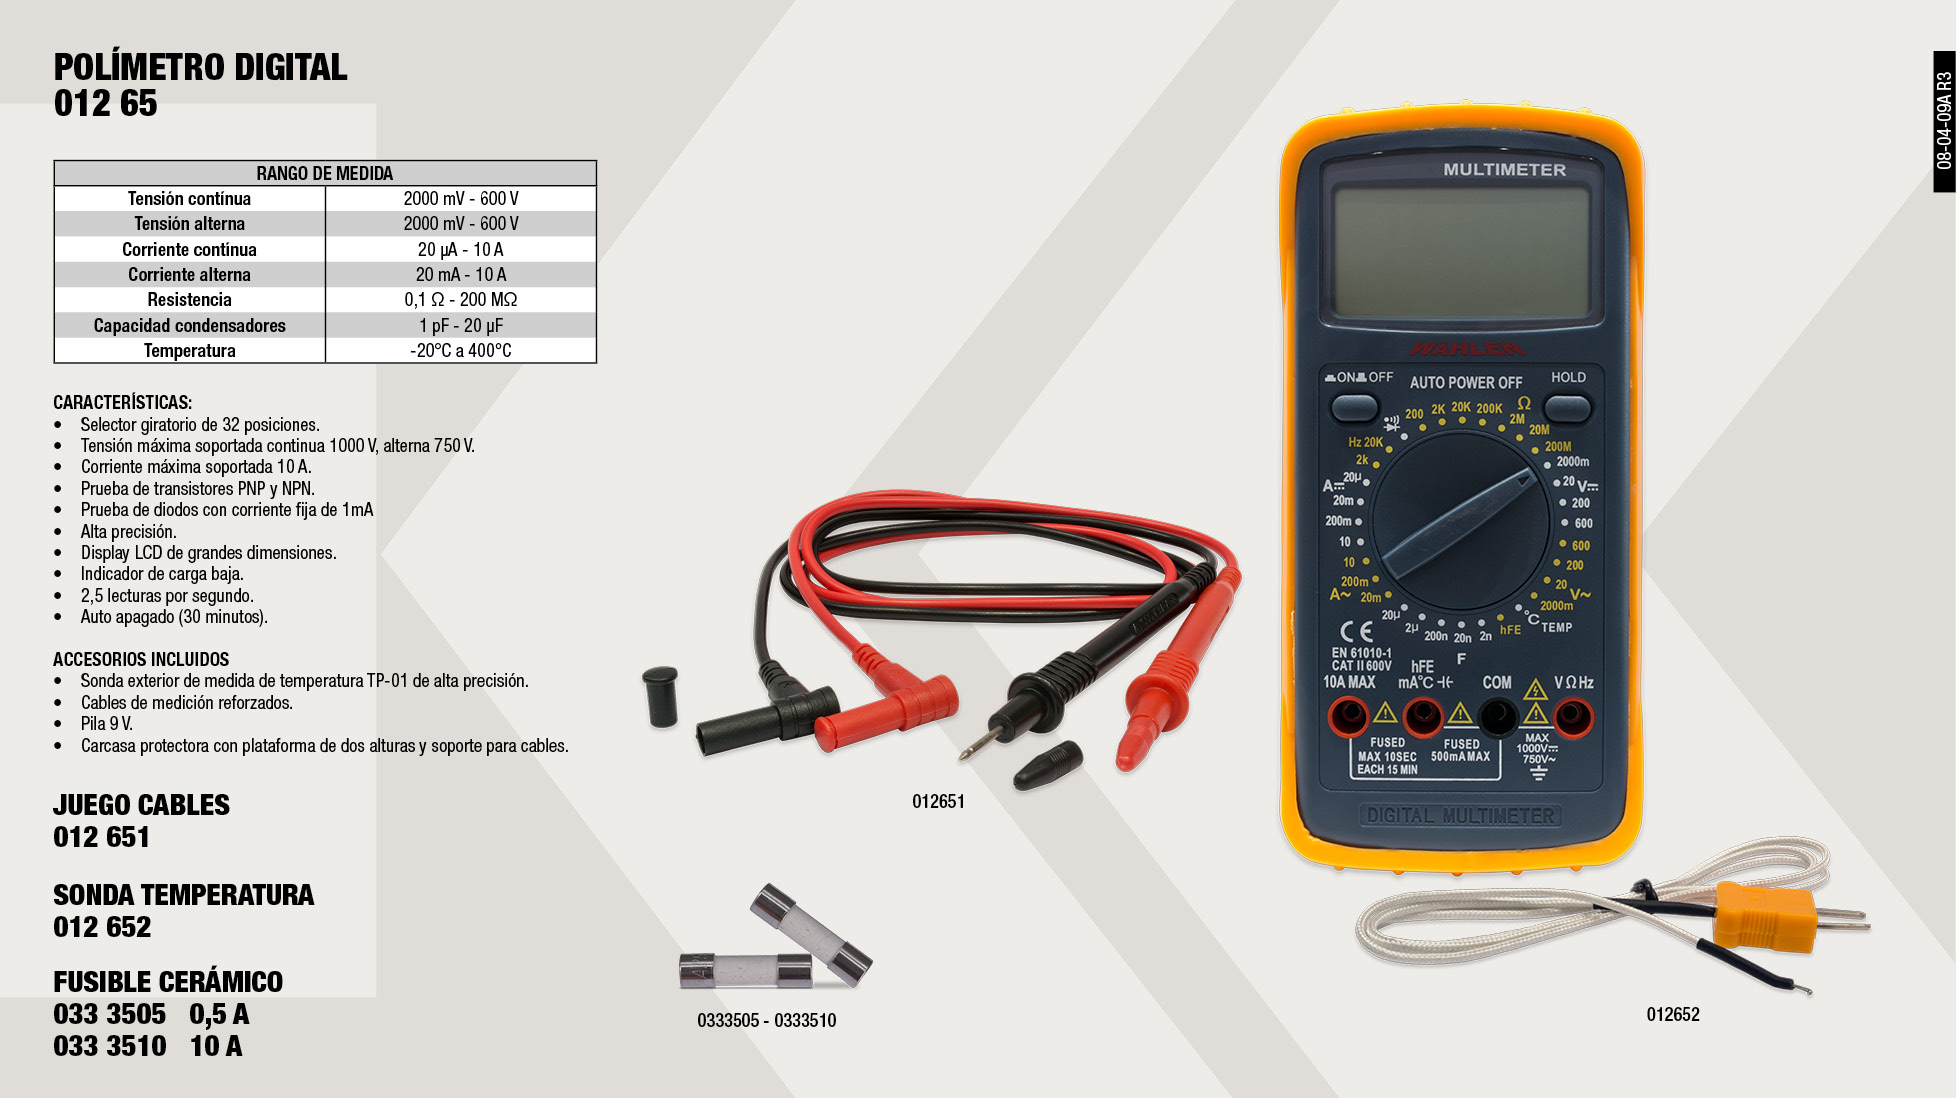 SONDA TEMPERATURA TESTER 01265                              ,  POLIMETRO DIGITAL CON TERMOMETRO                            ,  JUEGO CABLES TESTER 01265                                   ,